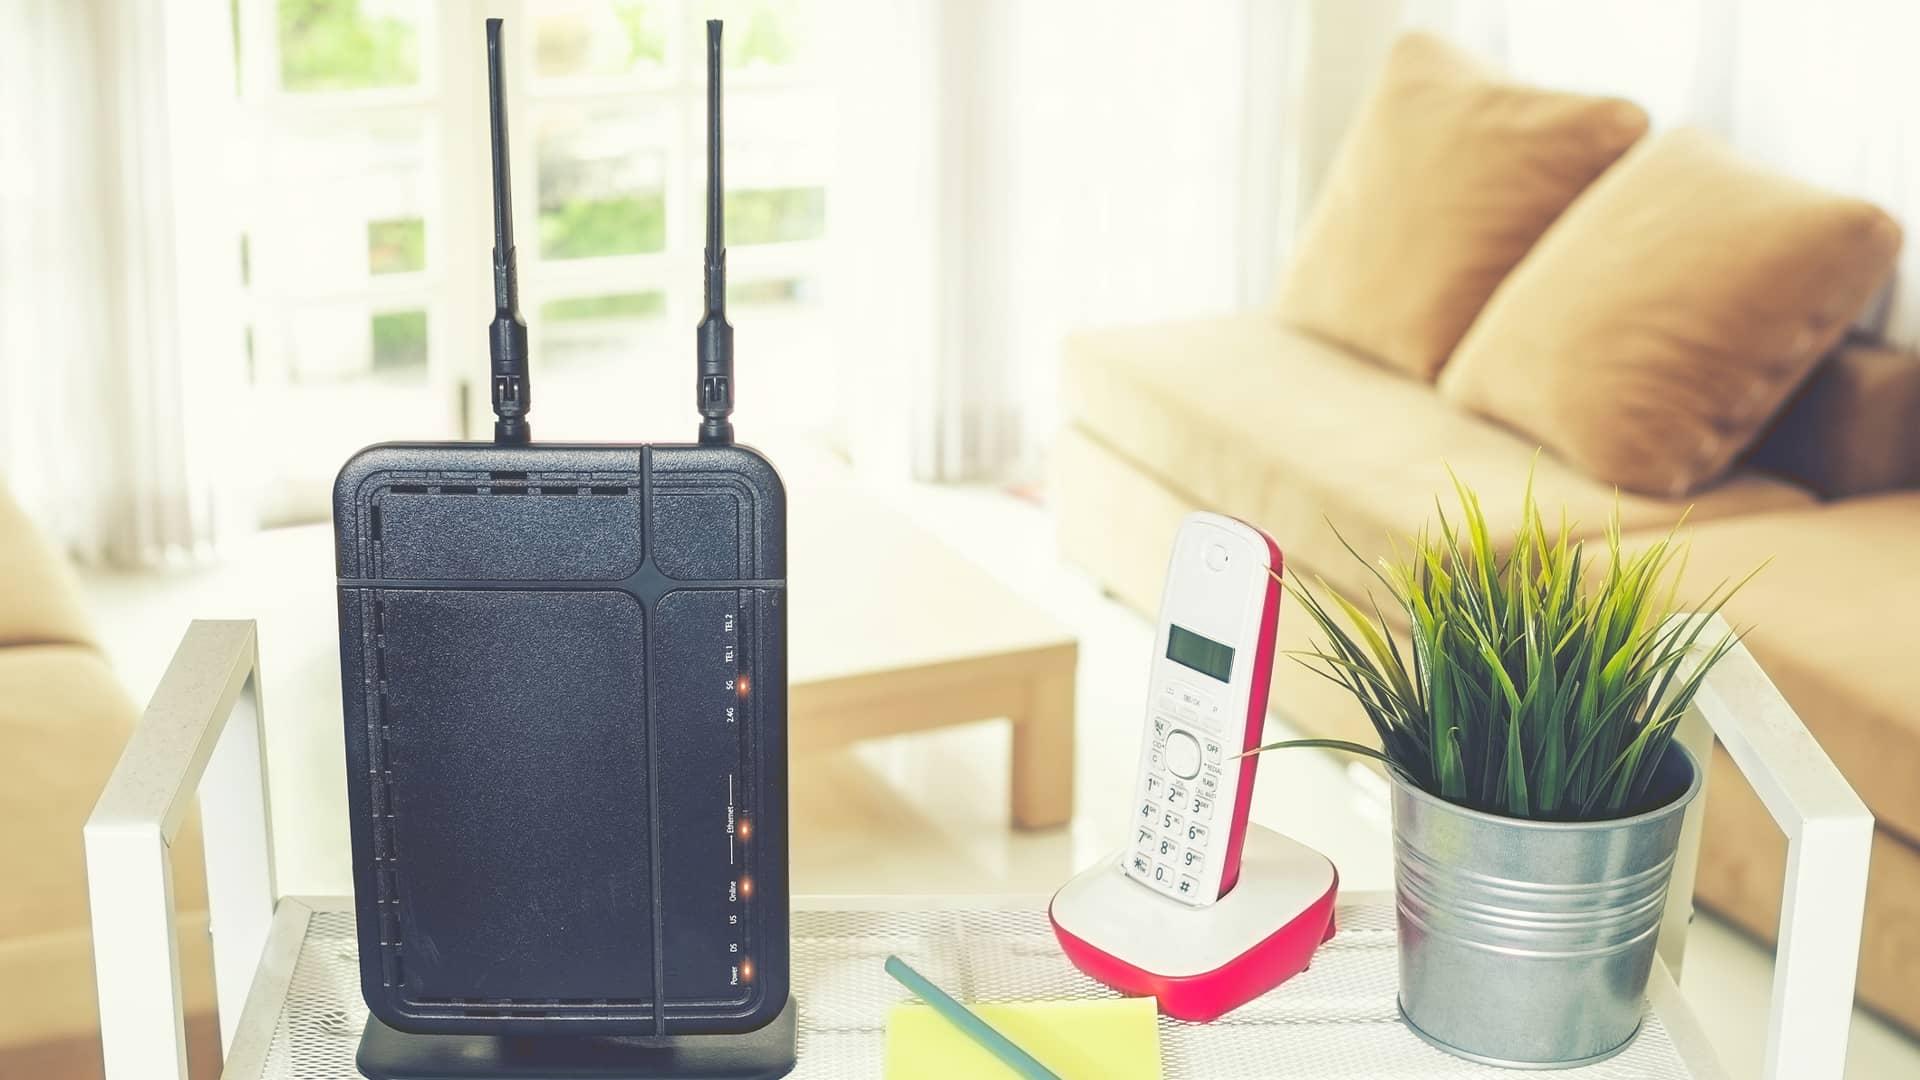 Descubre el router Movistar Home Station